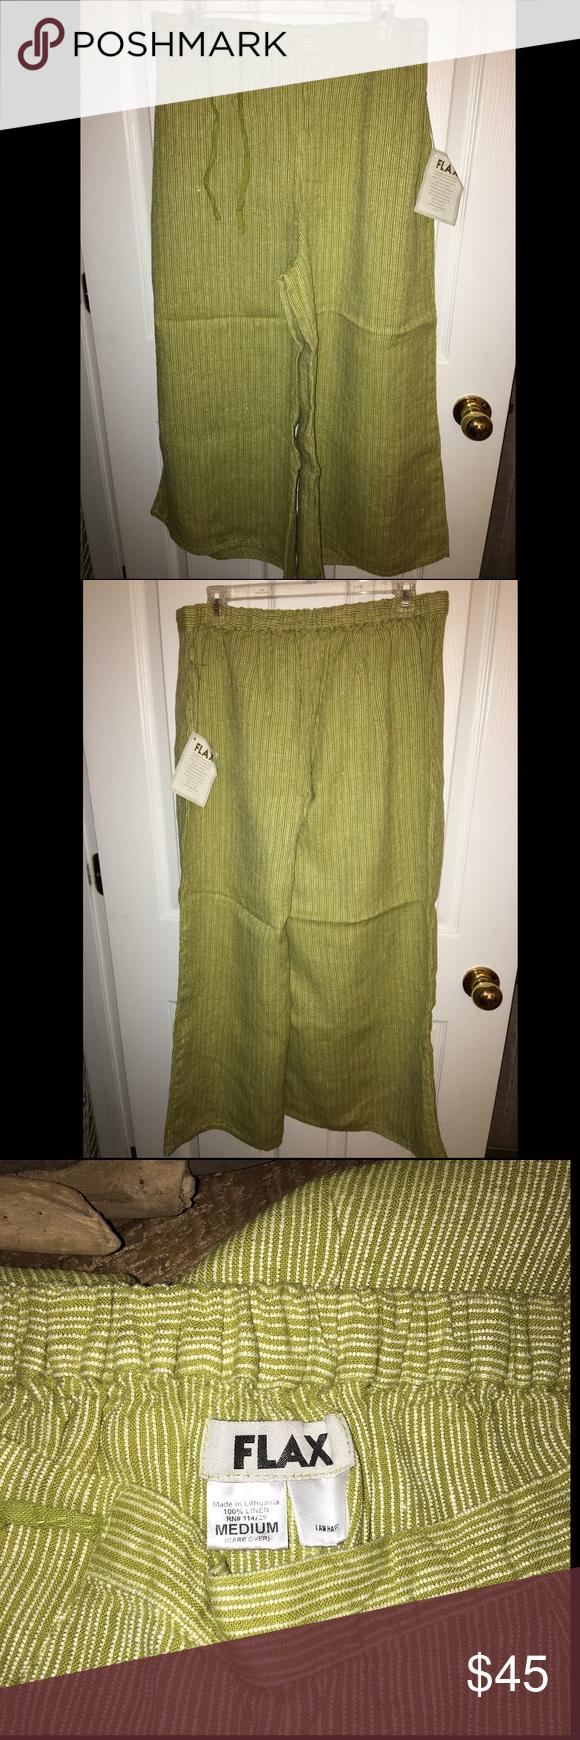 NWT FLAX Linen Gaucho Pants (medium weight) size M NWT FLAX Linen Gaucho Pants (medium weight) size M Flax Pants Wide Leg